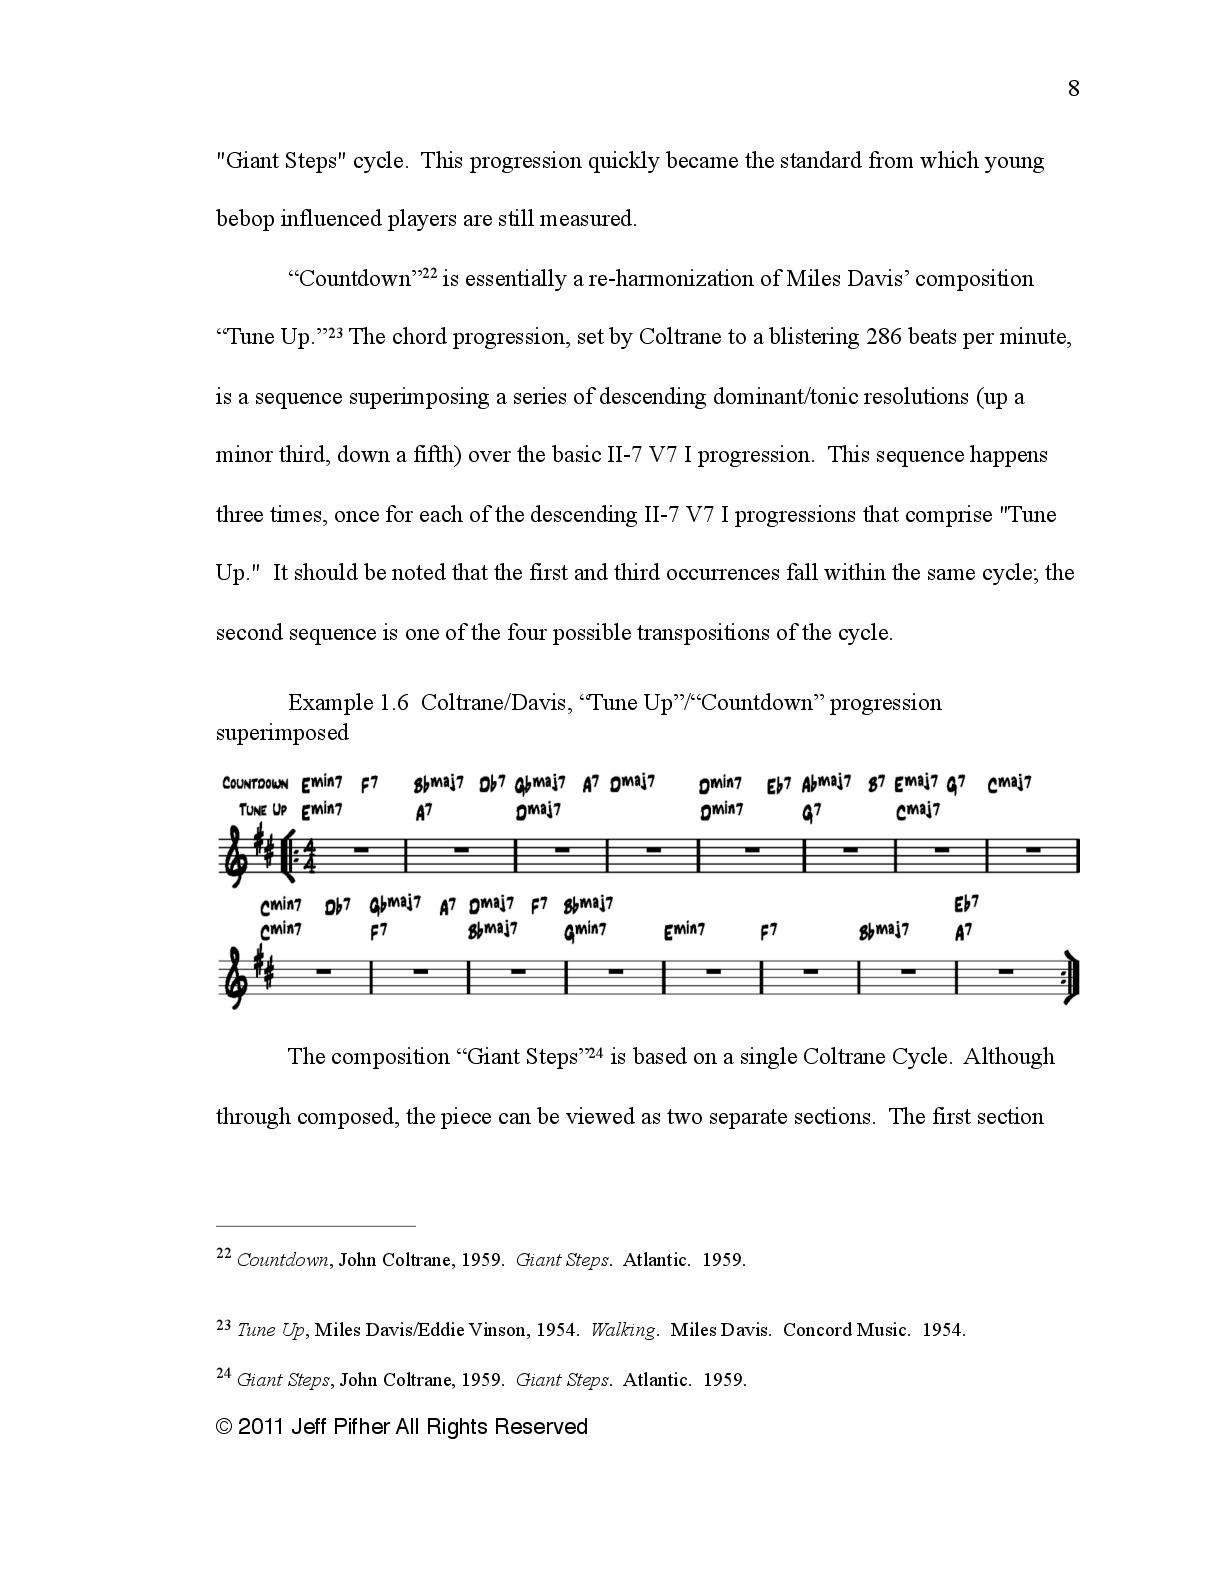 Jeff-Pifher-Academic-Series-Coltrane-Cycles-008.jpg